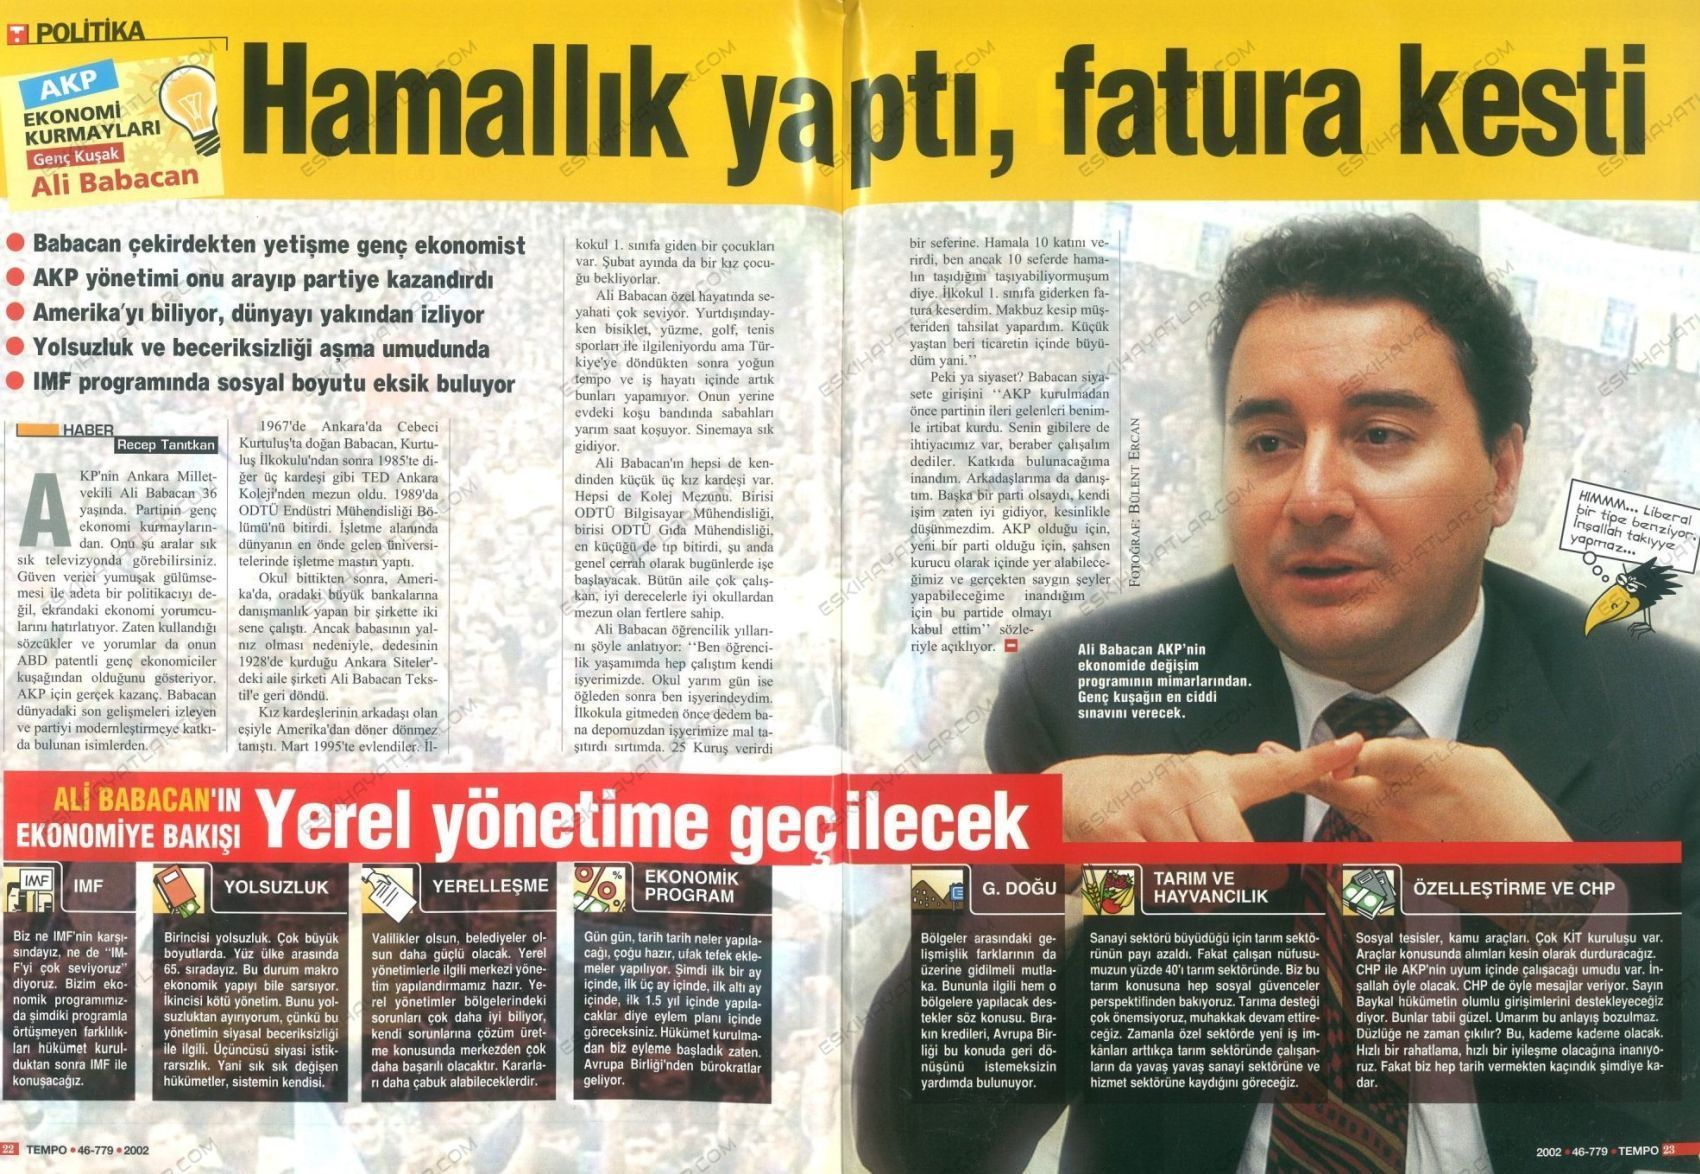 0355-turkiyenin-yeni-umudu-ak-parti-2002-tempo-dergisi-recep-tayyip-erdogan (2)